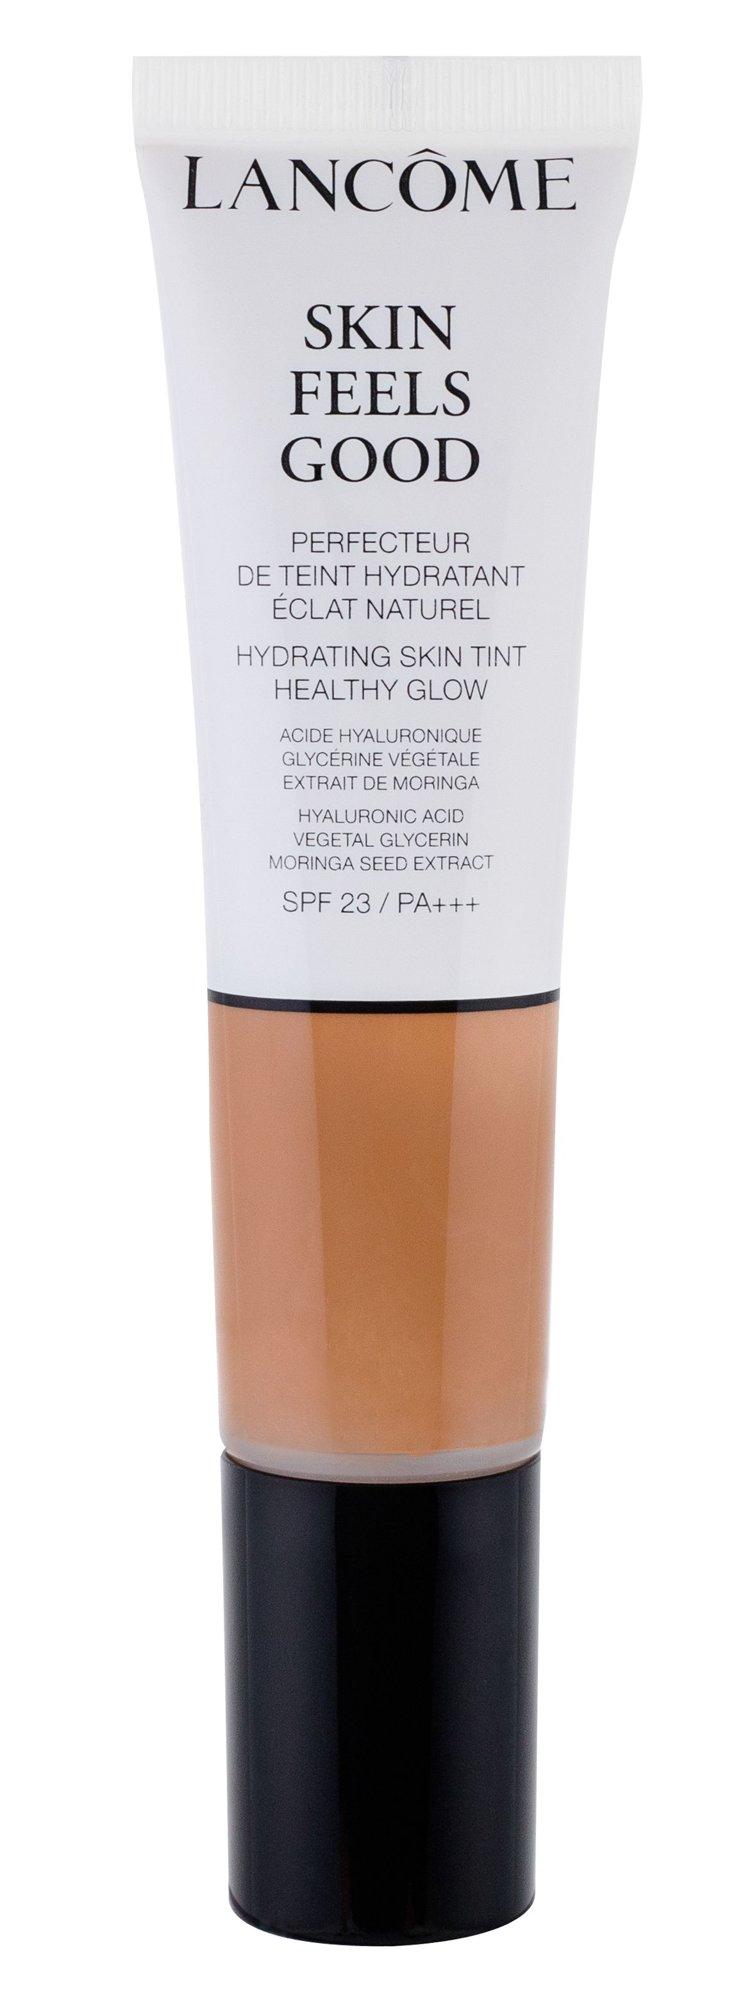 Lancôme Skin Feels Good Makeup 32ml 04C Golden Sand